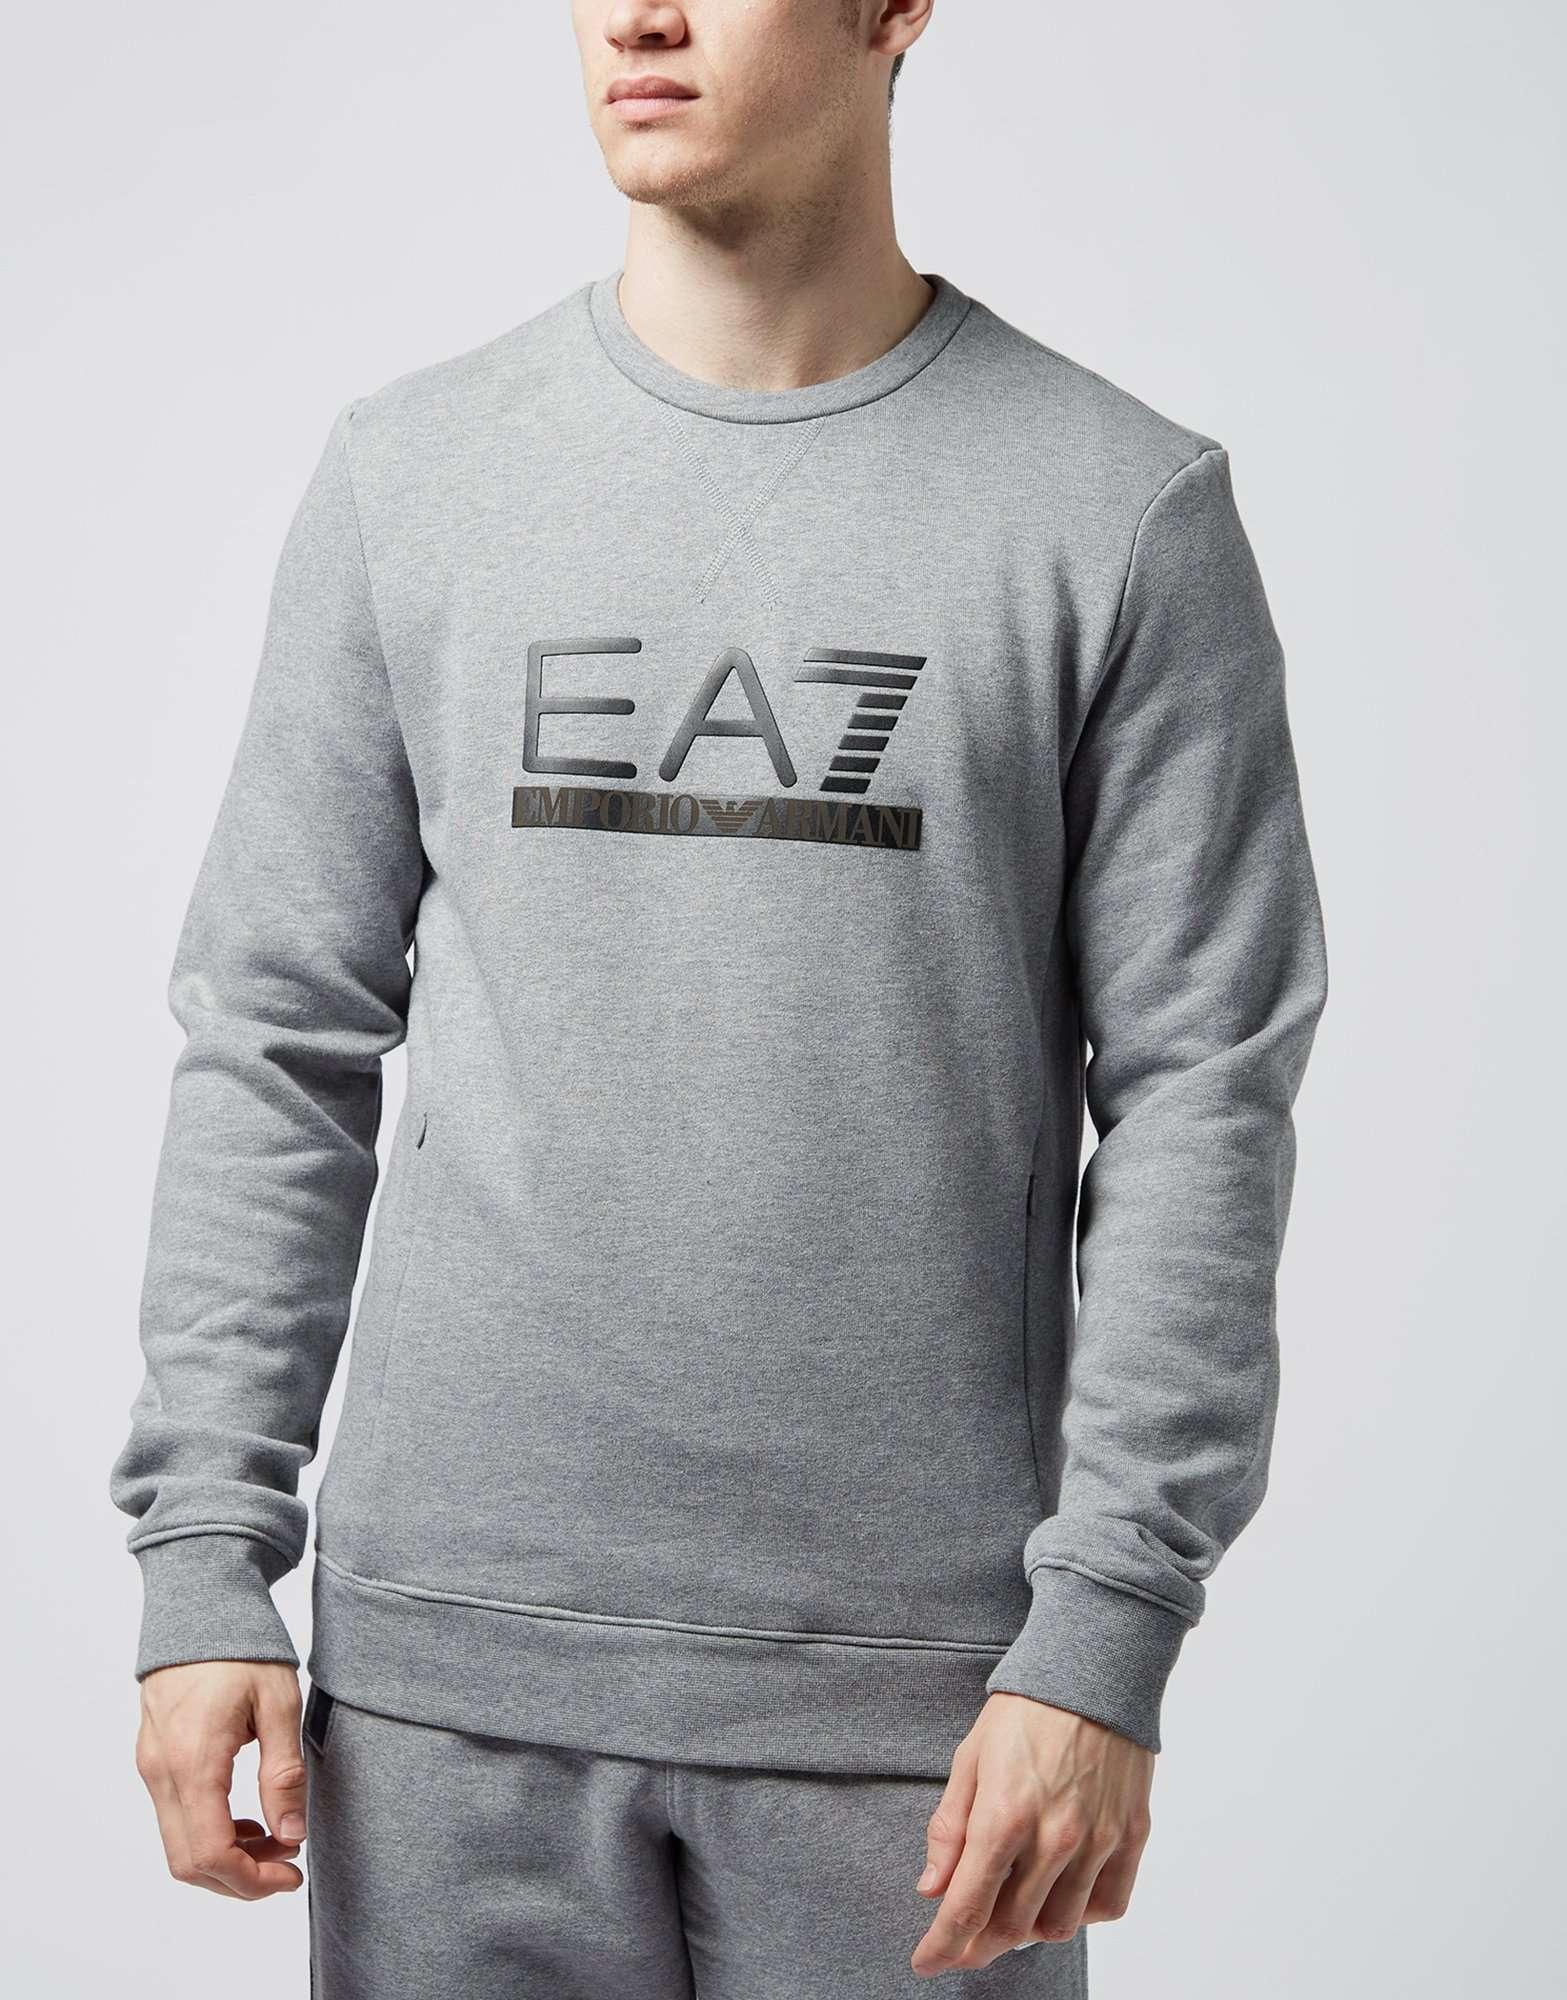 00c086e8 Emporio Armani EA7 Leather Style Crew Sweatshirt - Exclusive ...